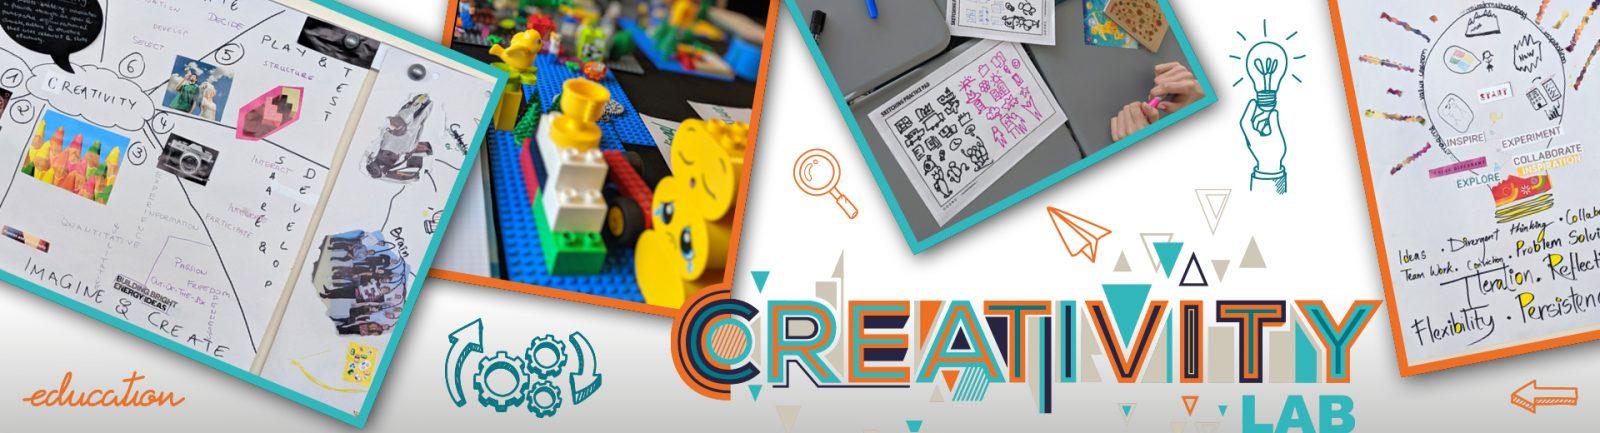 creativity_lab